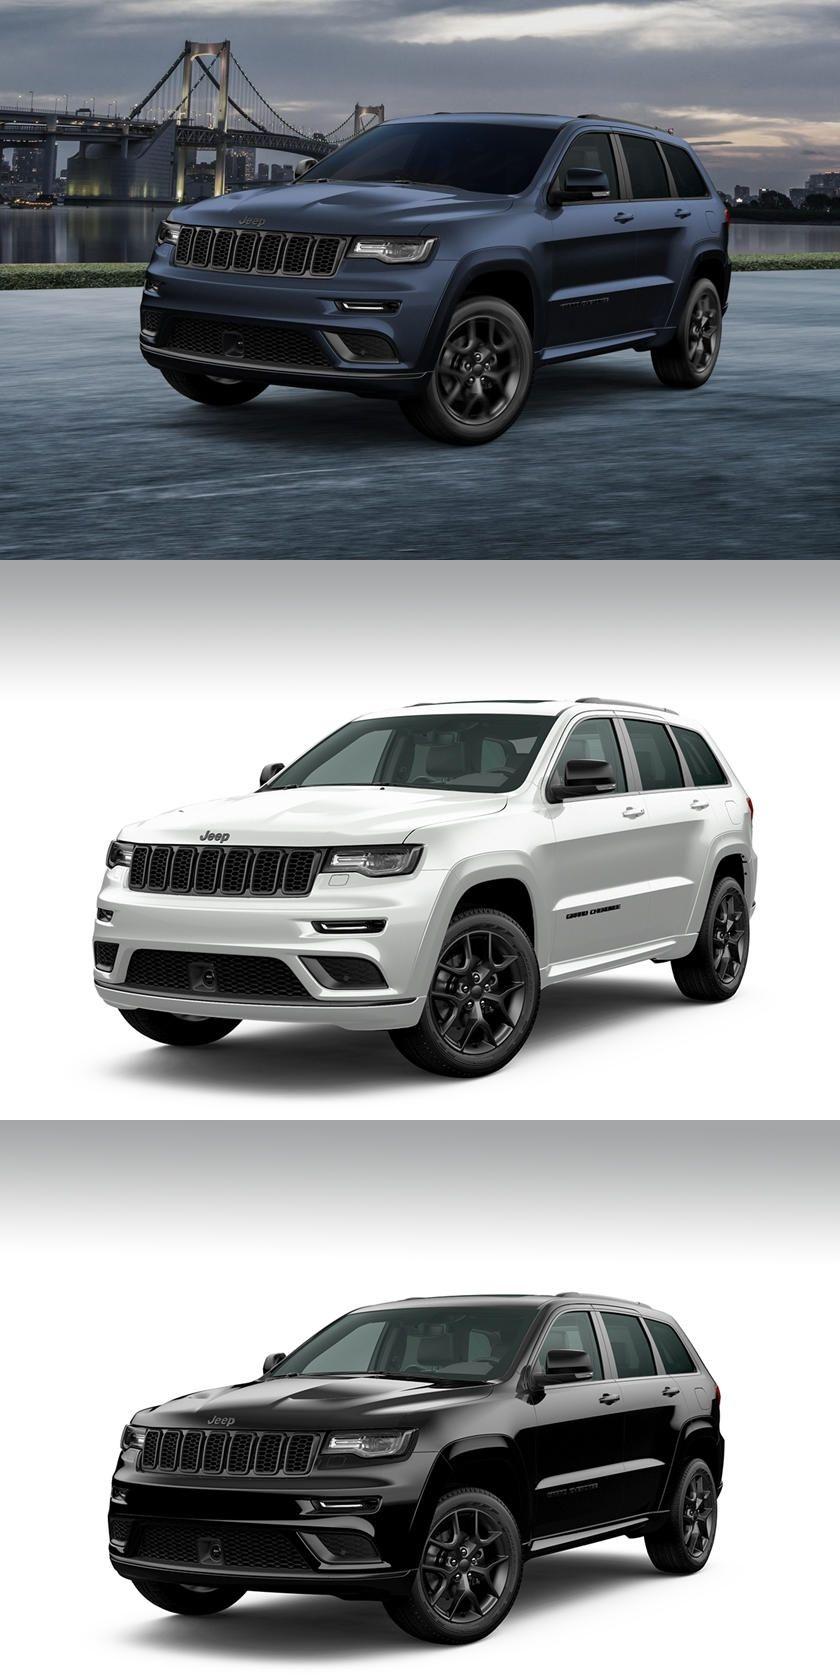 2021 Jeep Wagoneer Research New In 2020 Jeep Wagoneer Jeep New Jeep Grand Cherokee